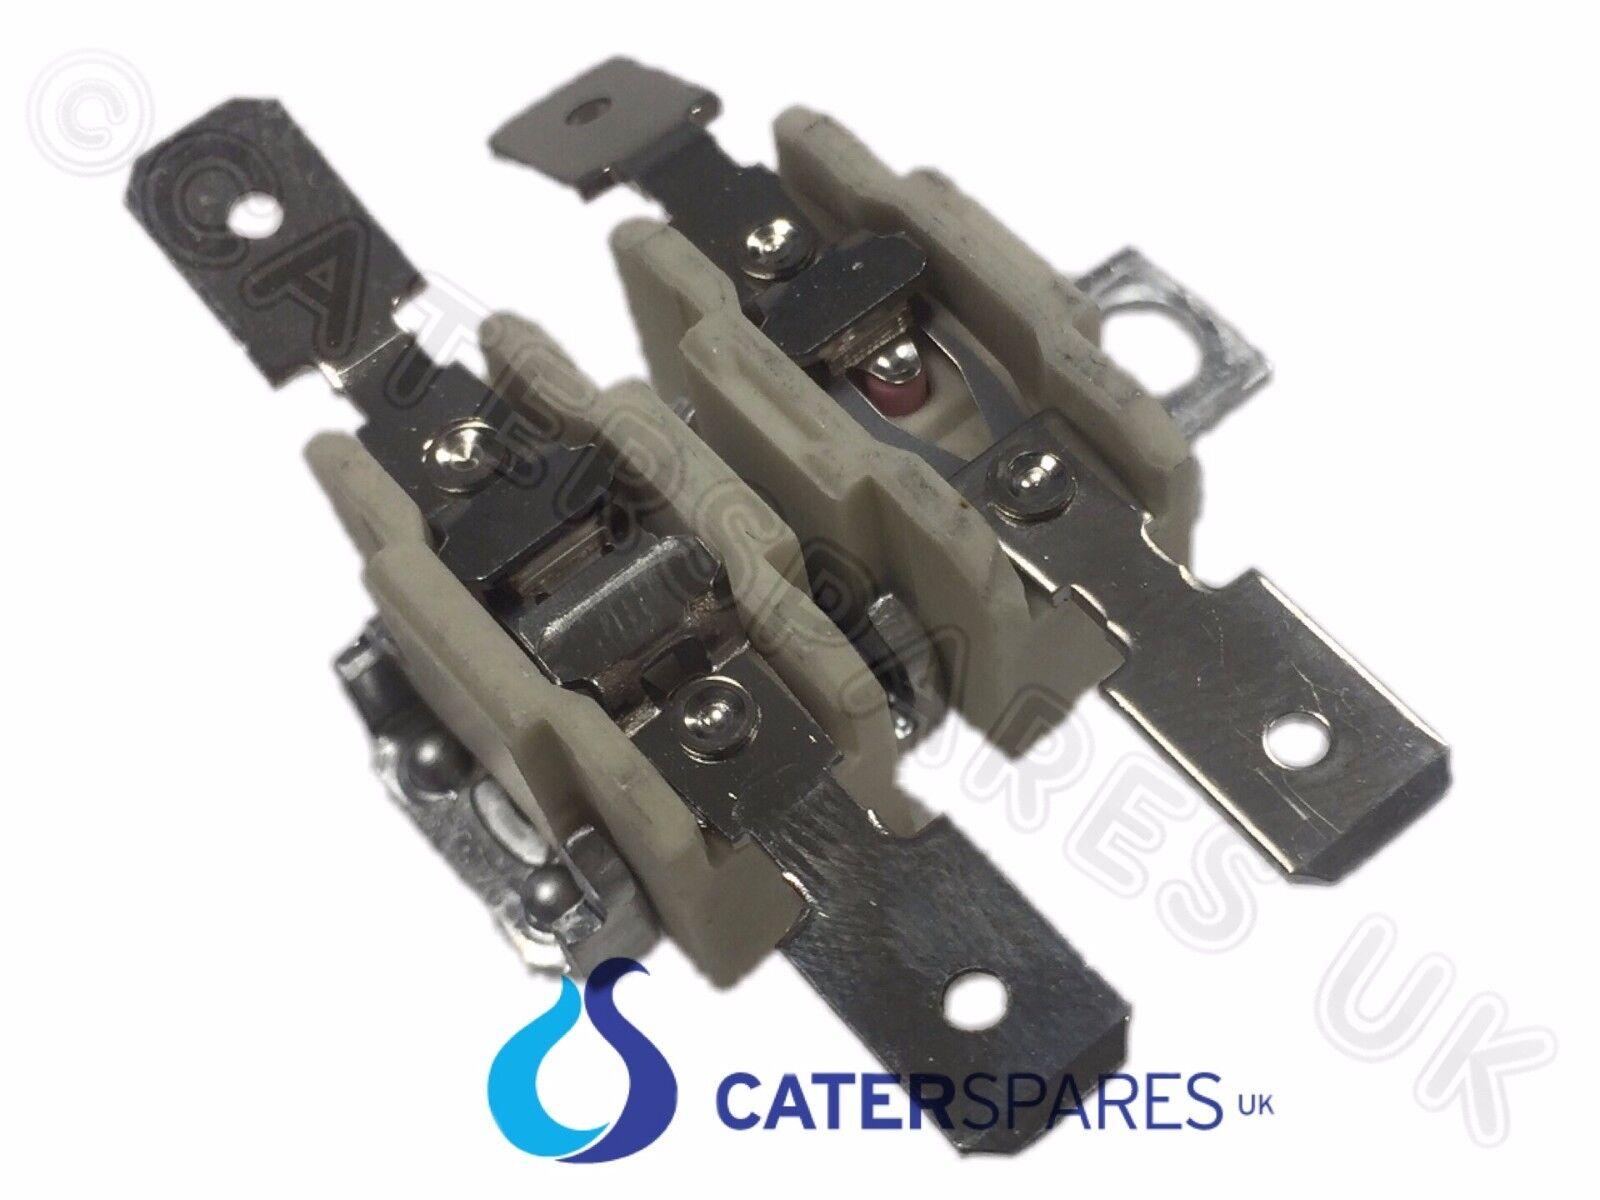 Image of 00132 Dualit Klixon Contact Thermostat Sandwich Toastie Fabricant Gril de